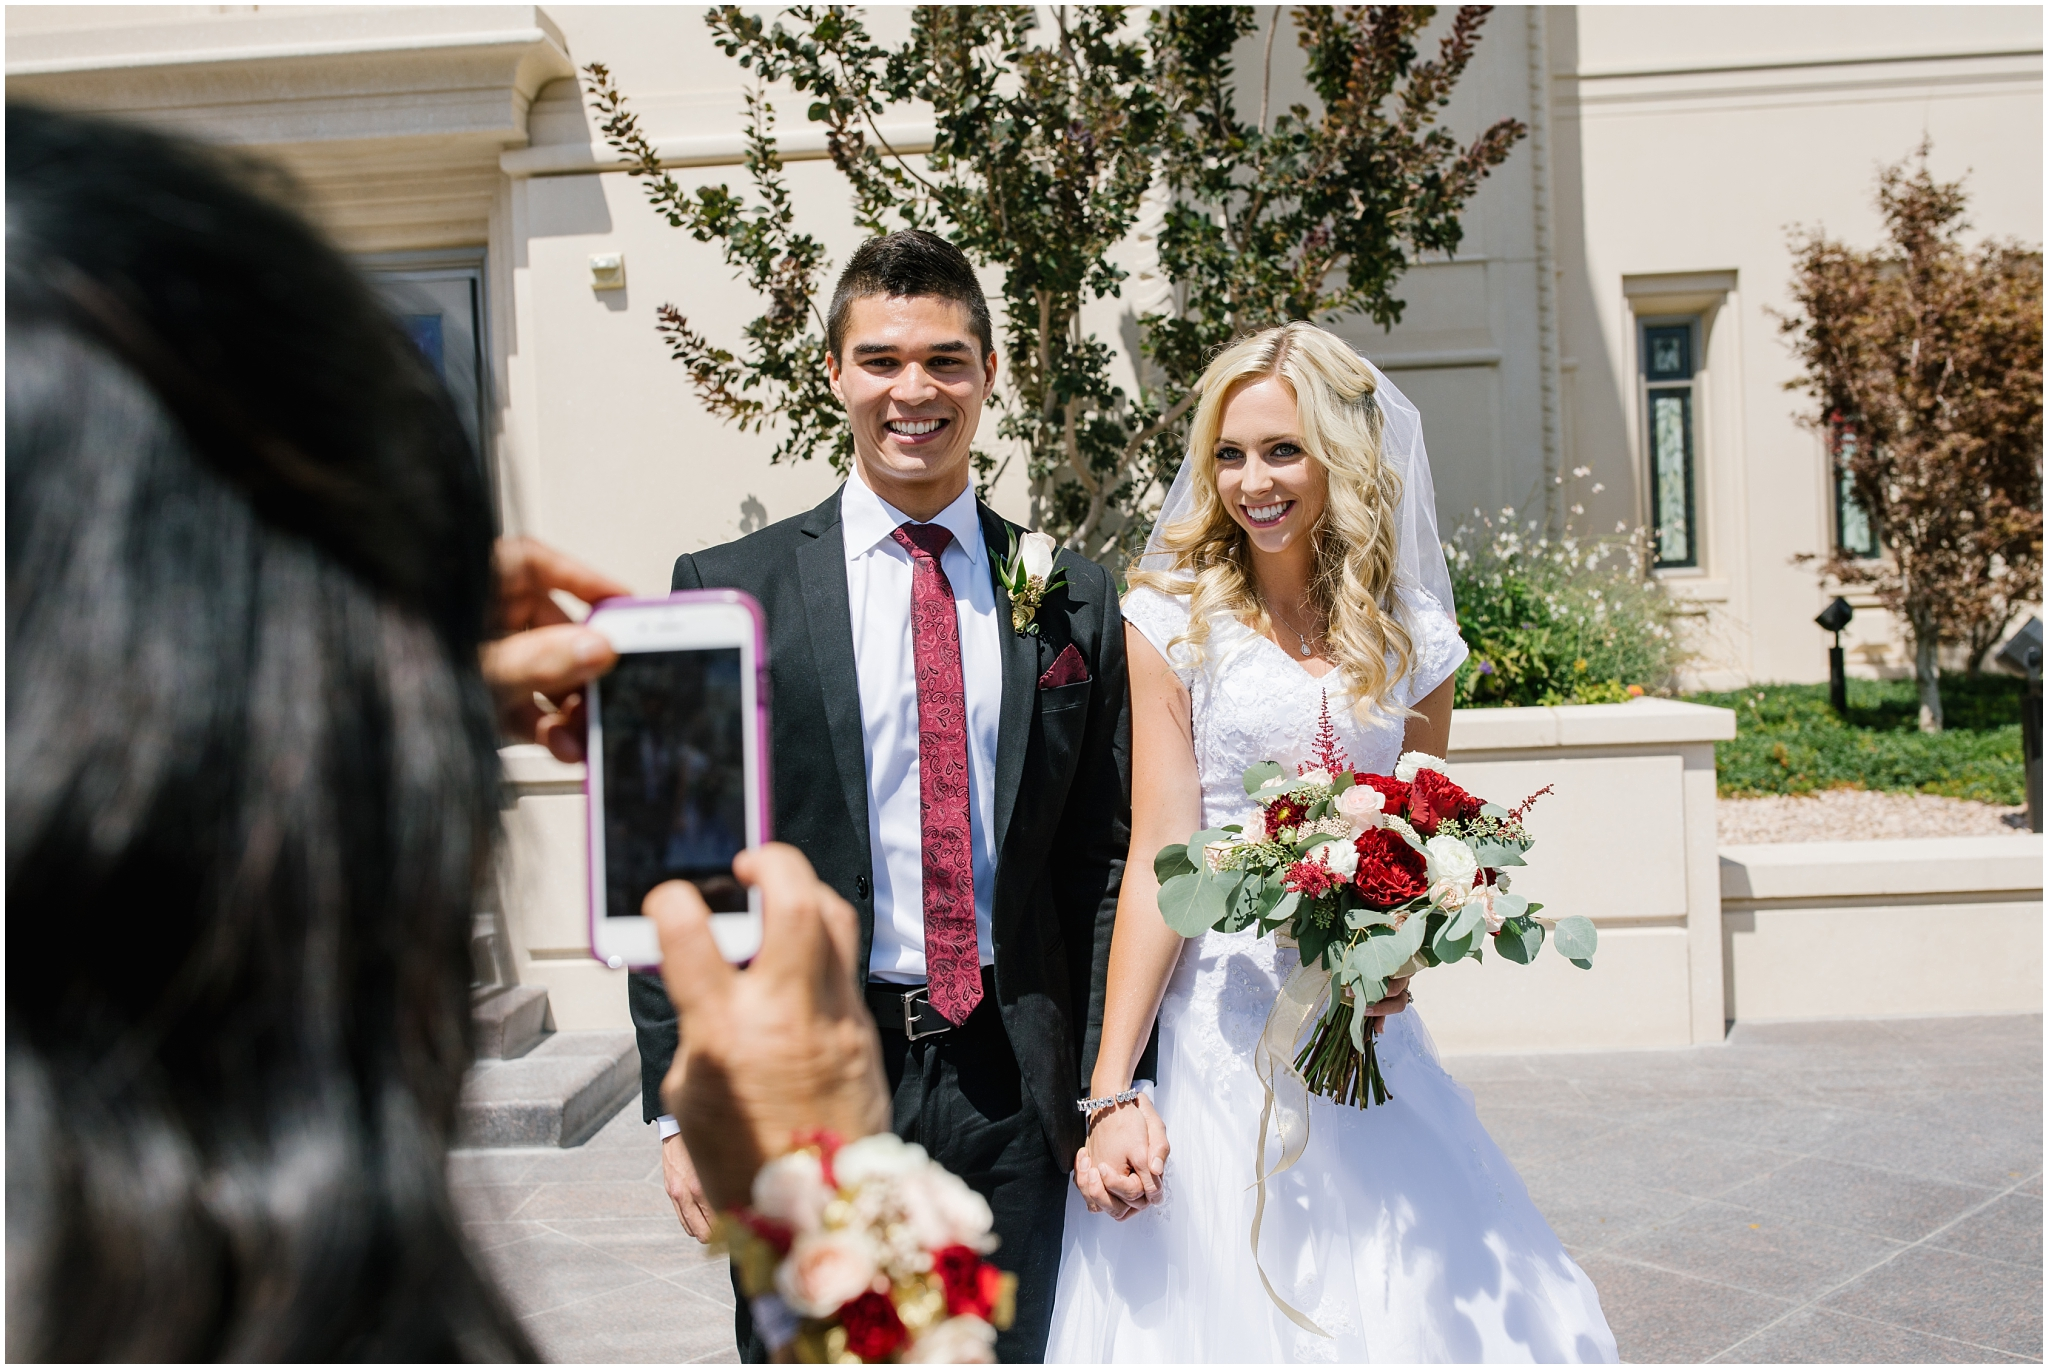 HannahChaseWedding-31_Lizzie-B-Imagery-Utah-Wedding-Photographer-Park-City-Salt-Lake-City-Payson-Temple-Clarion-Garden-Center.jpg